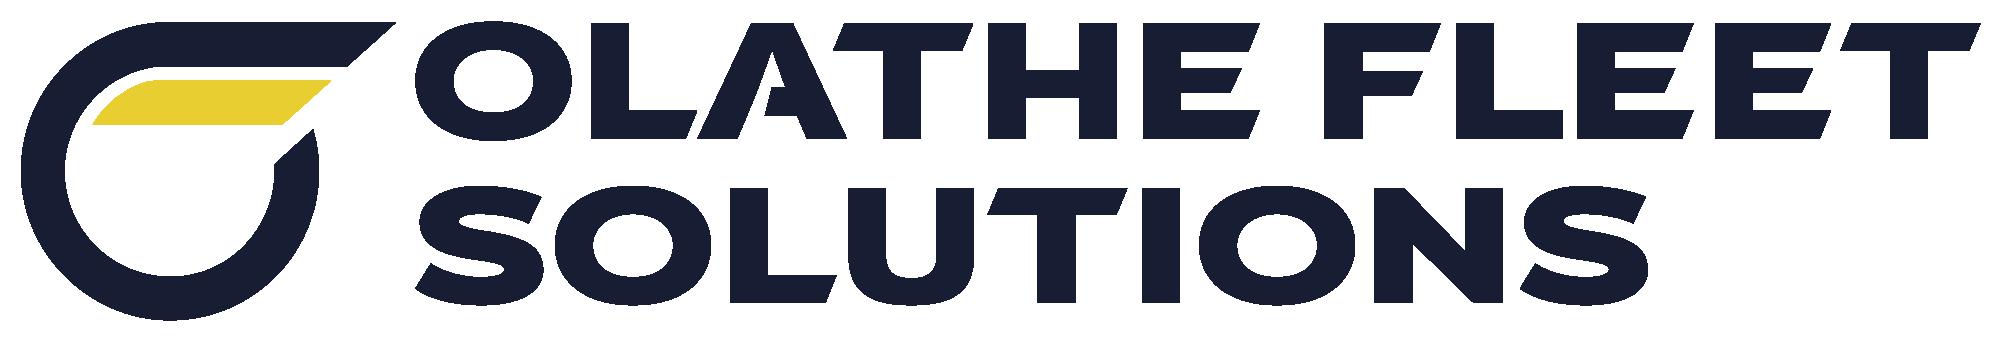 Olathe Fleet Solutions Logo